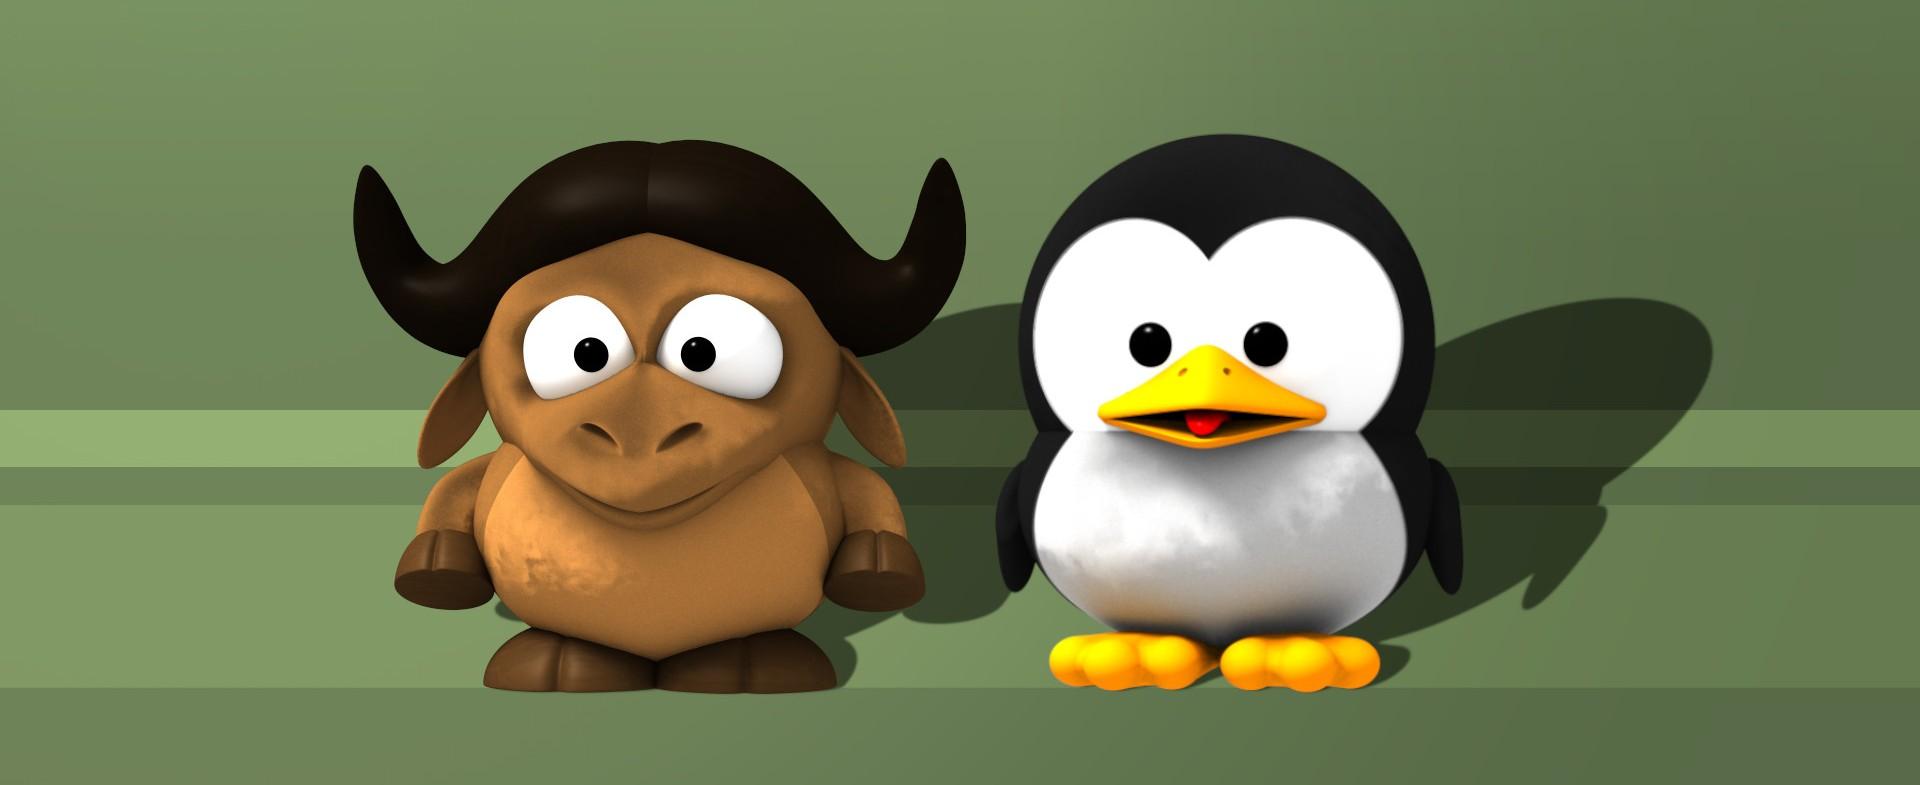 storia di Linux cover